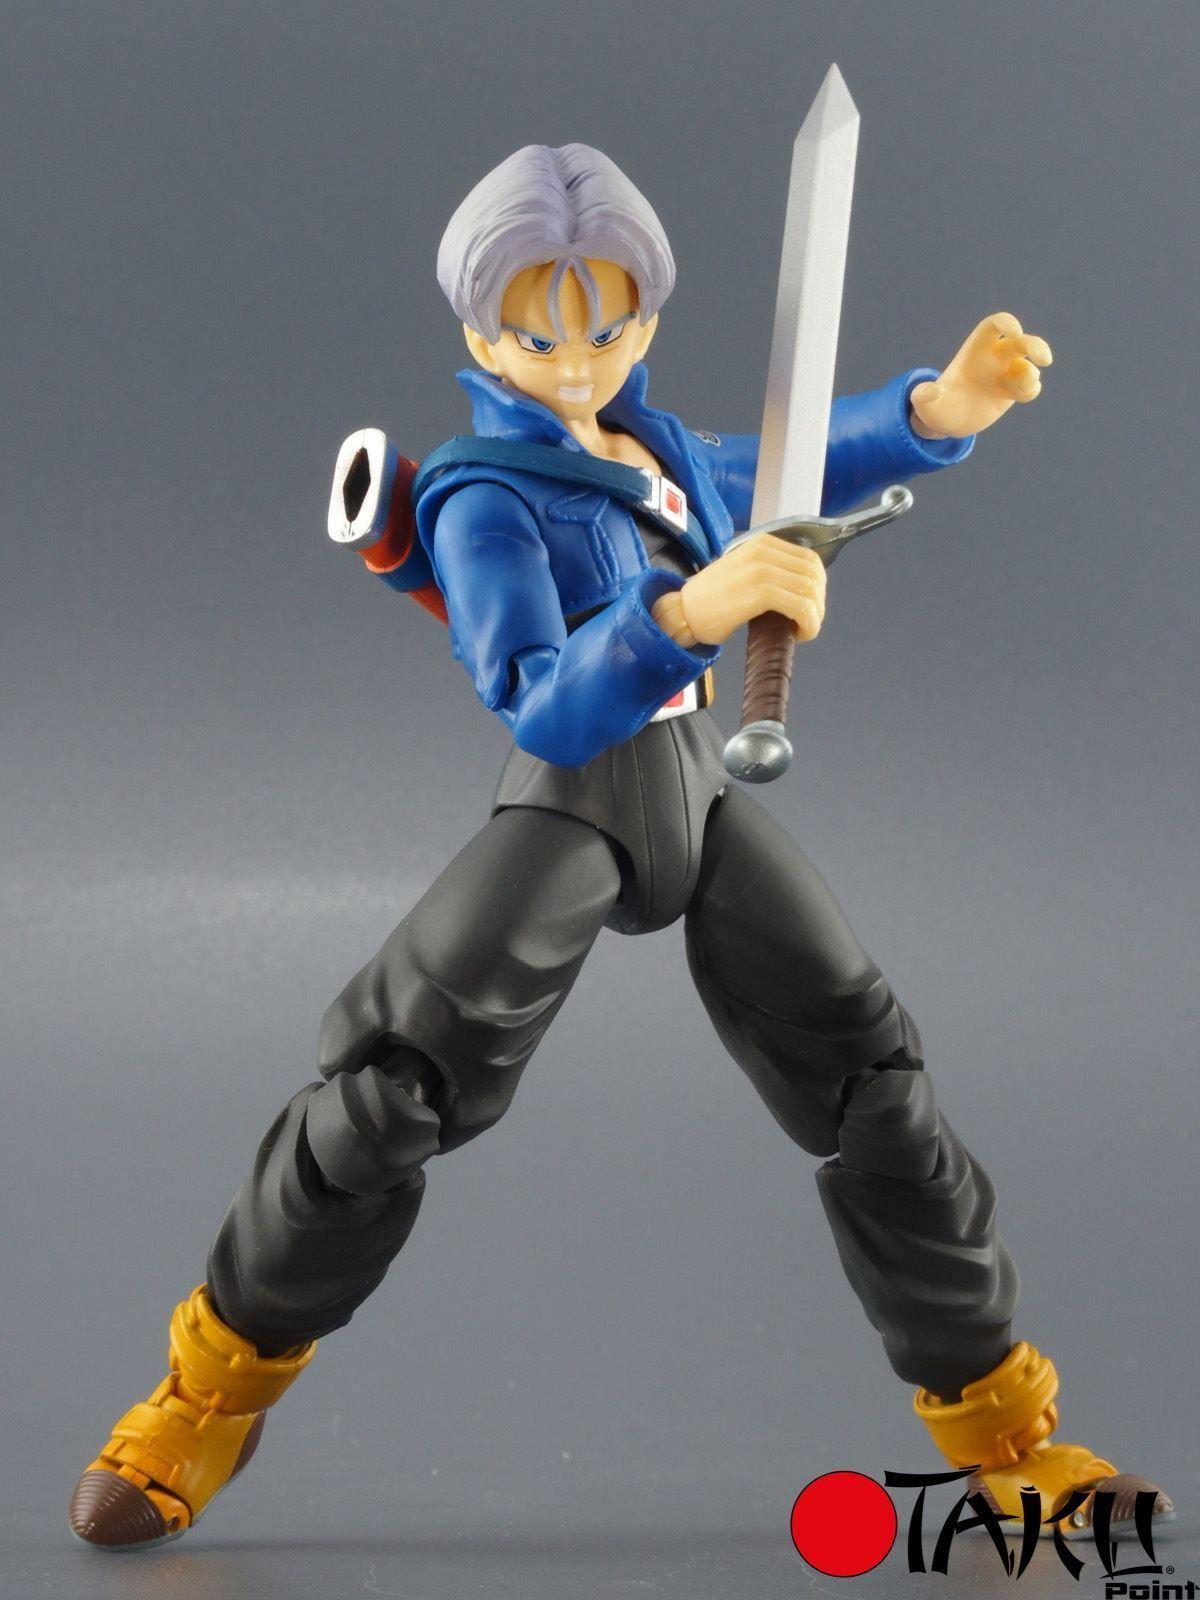 Dragon Ball Z S.H.Figuarts SHF Trunks Premium Color Edition Bandai Tamashii Web